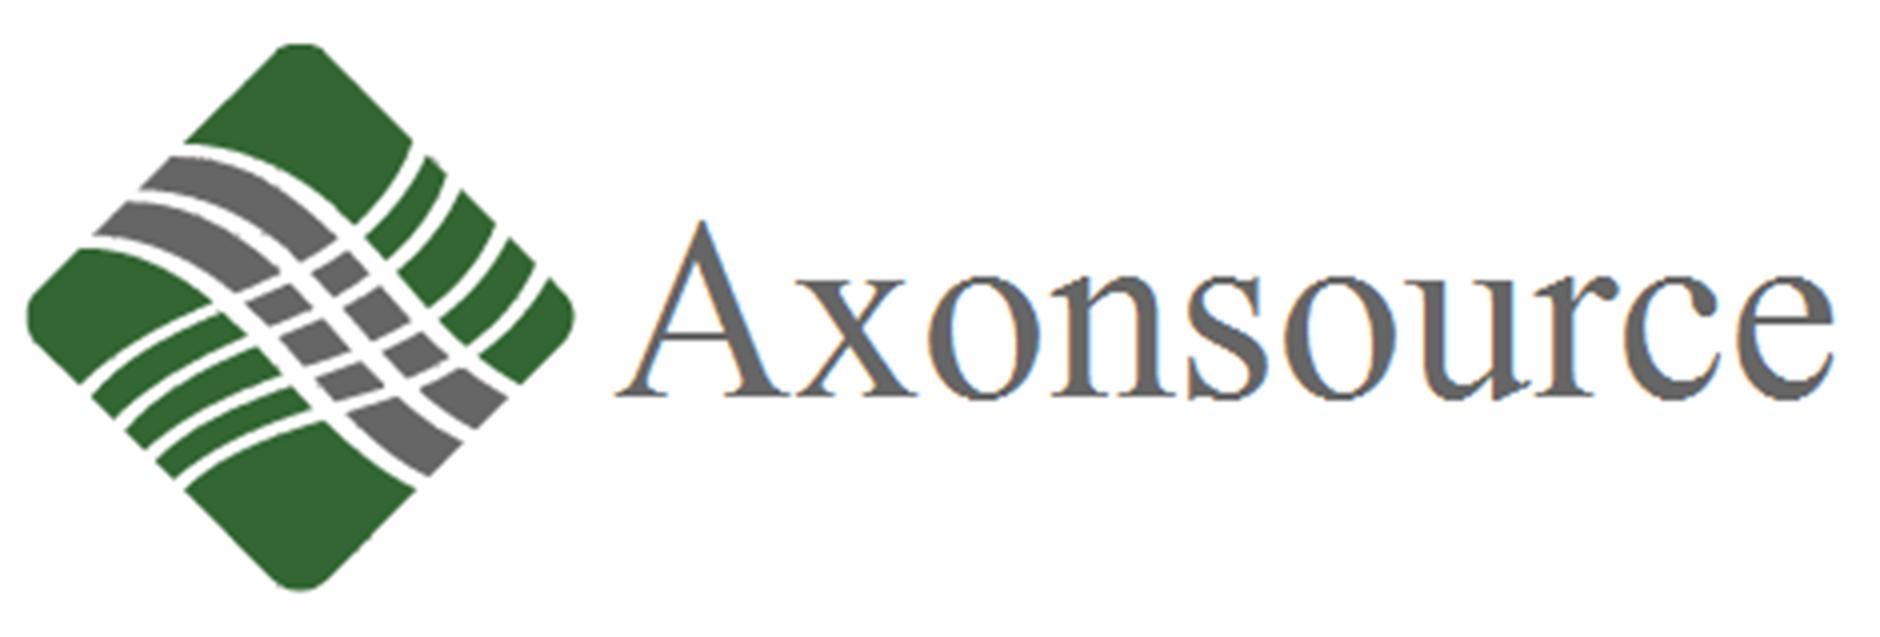 Axonsource